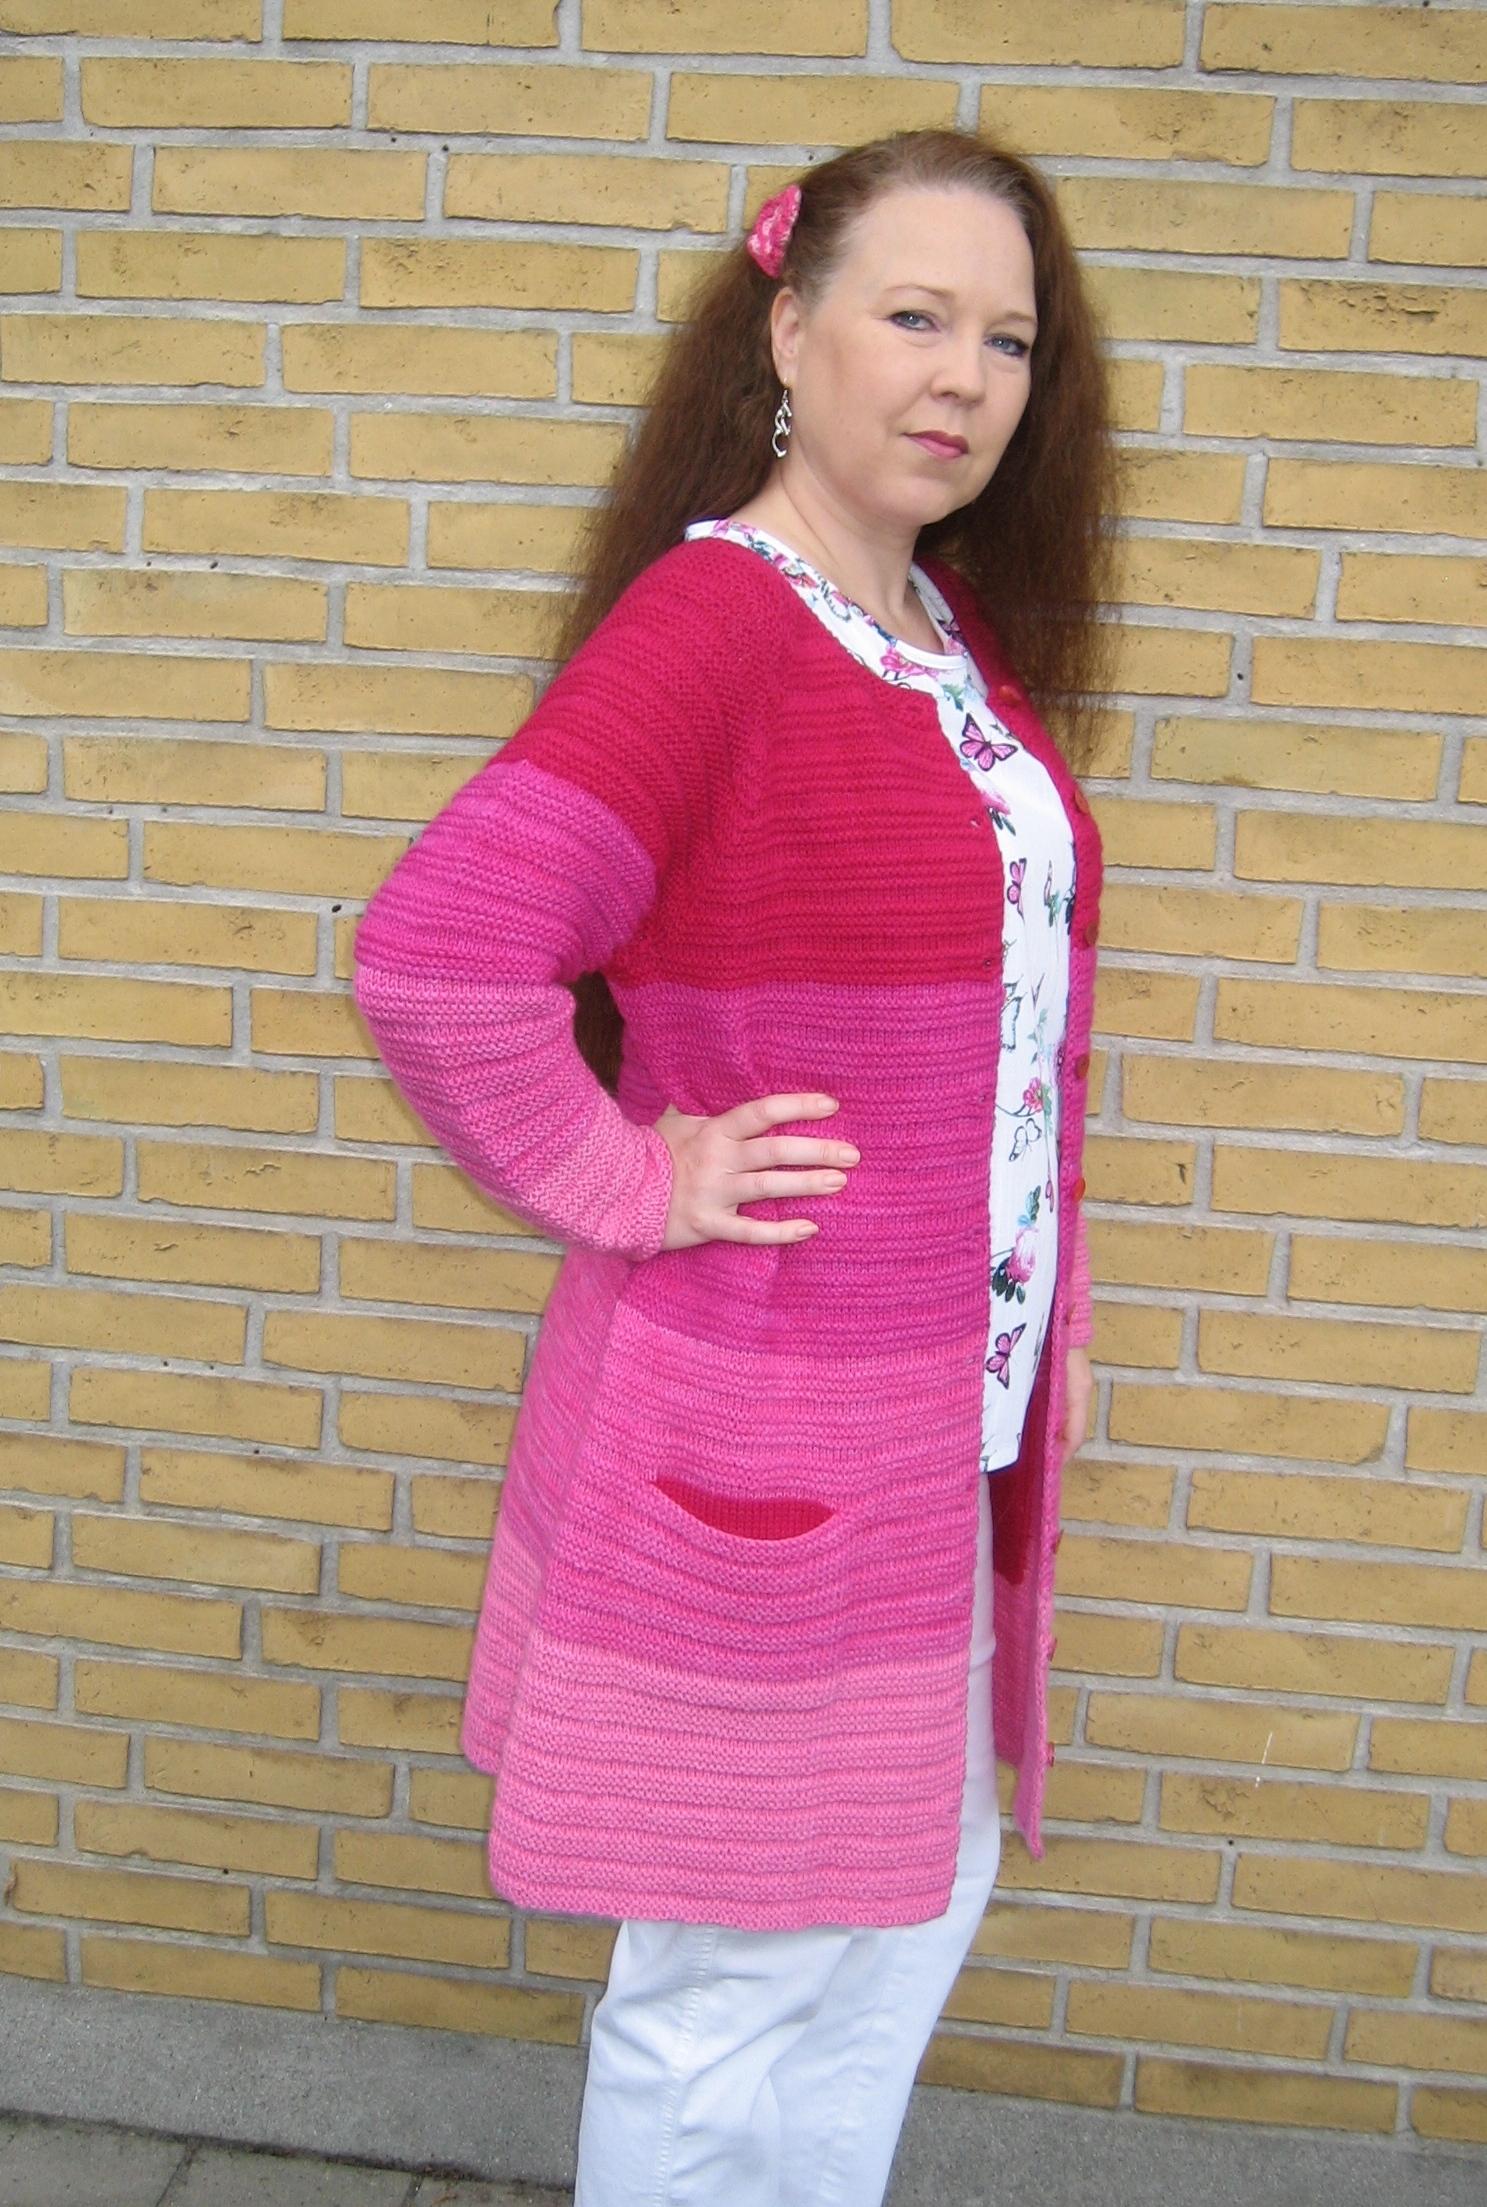 annette-danielsen-knittingfools-skyggespil-cardigan-garnyarn-merinould-cascade-heritage-babyalpaka-pink